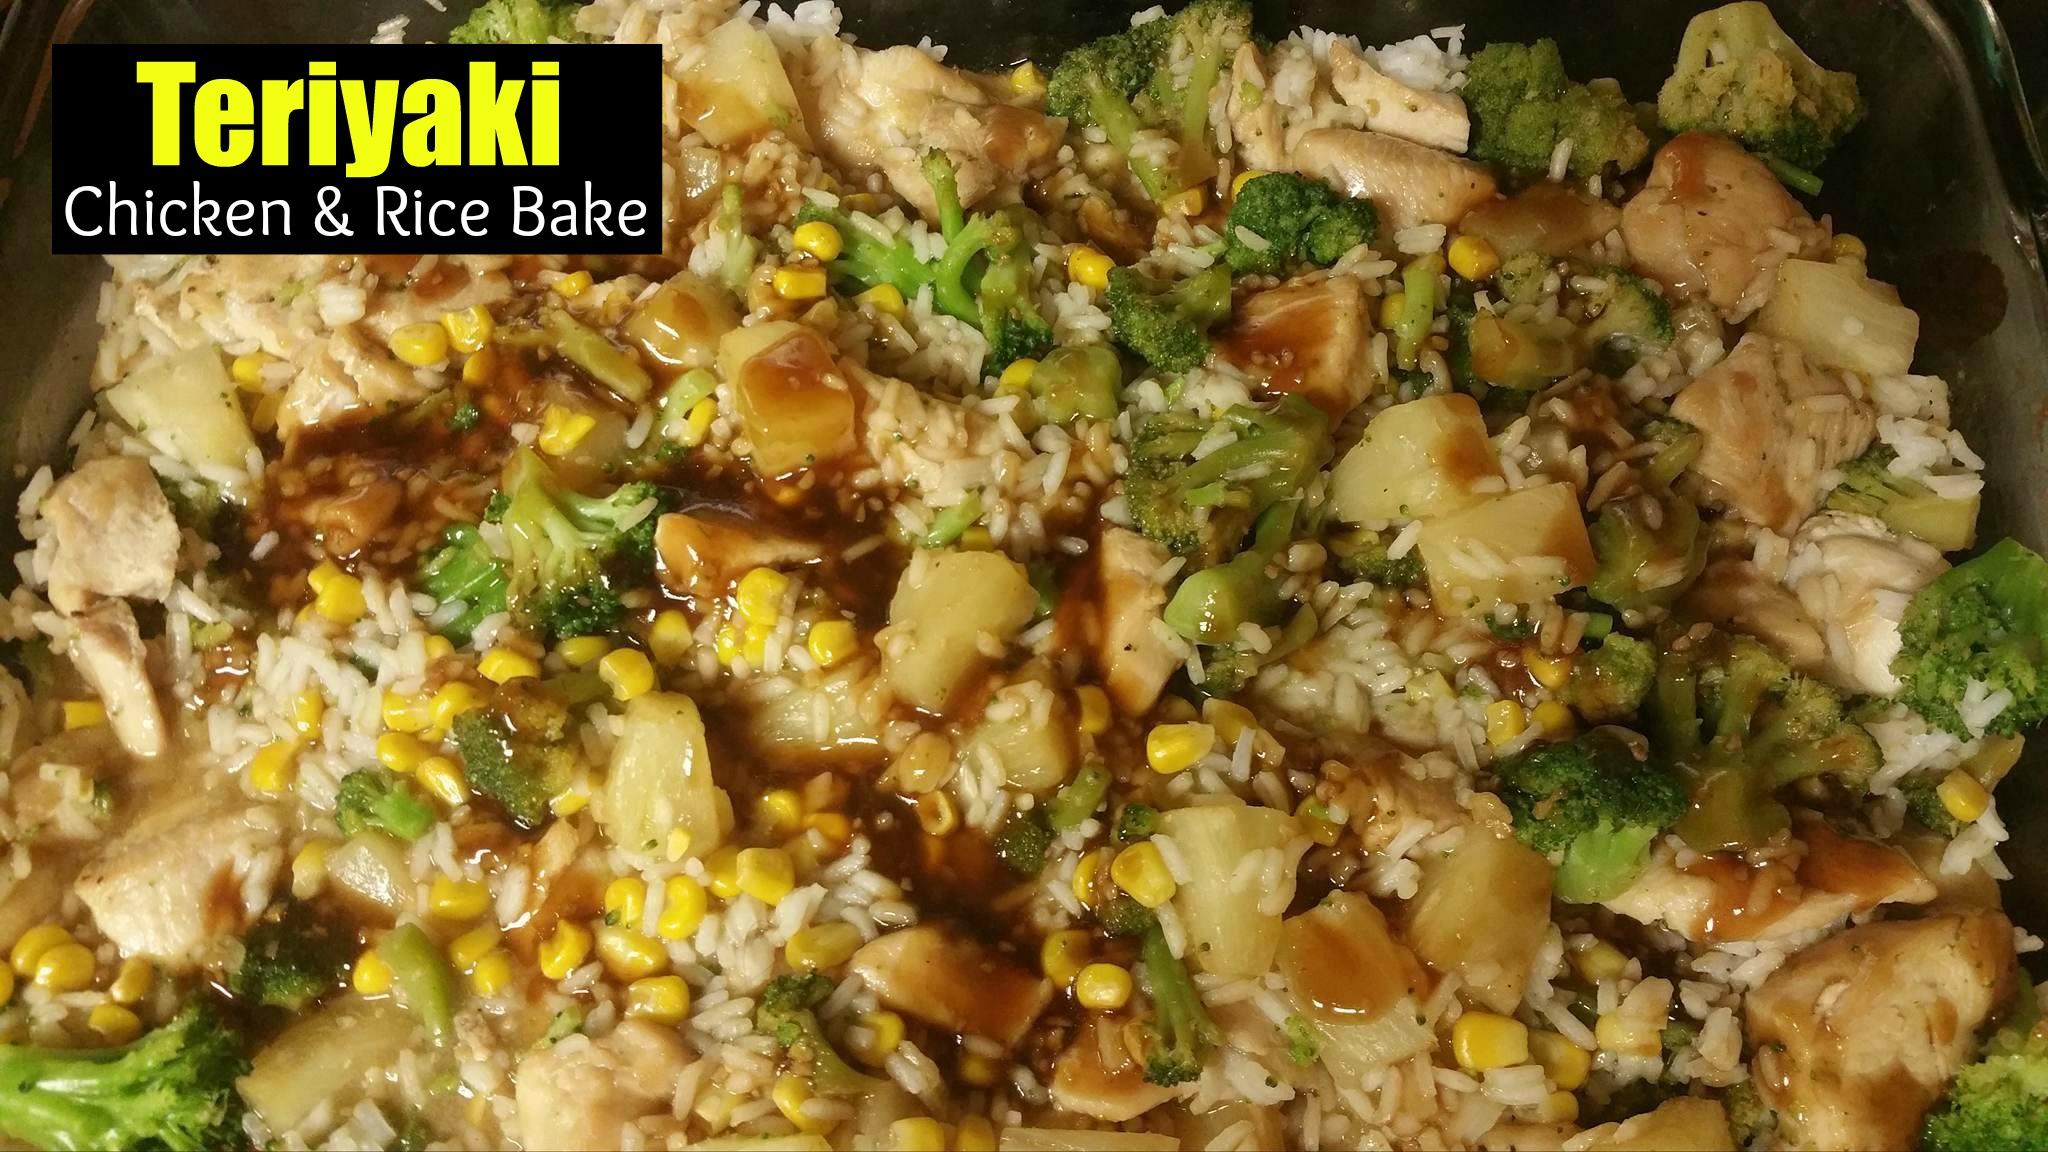 Teriyaki Chicken & Rice Bake